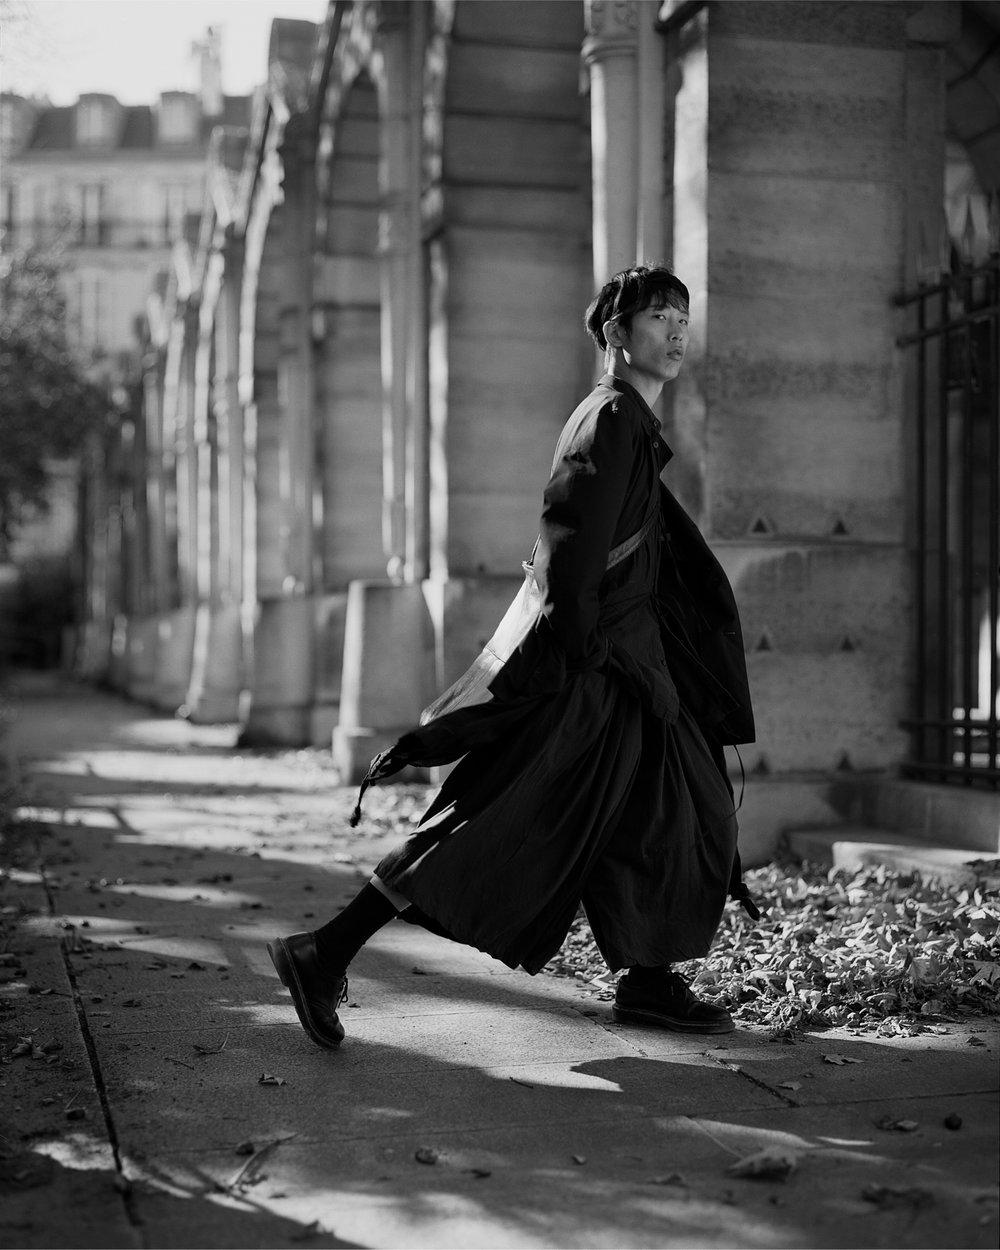 tb-fieulaine-Gwak-Yohji-Paris7.jpg